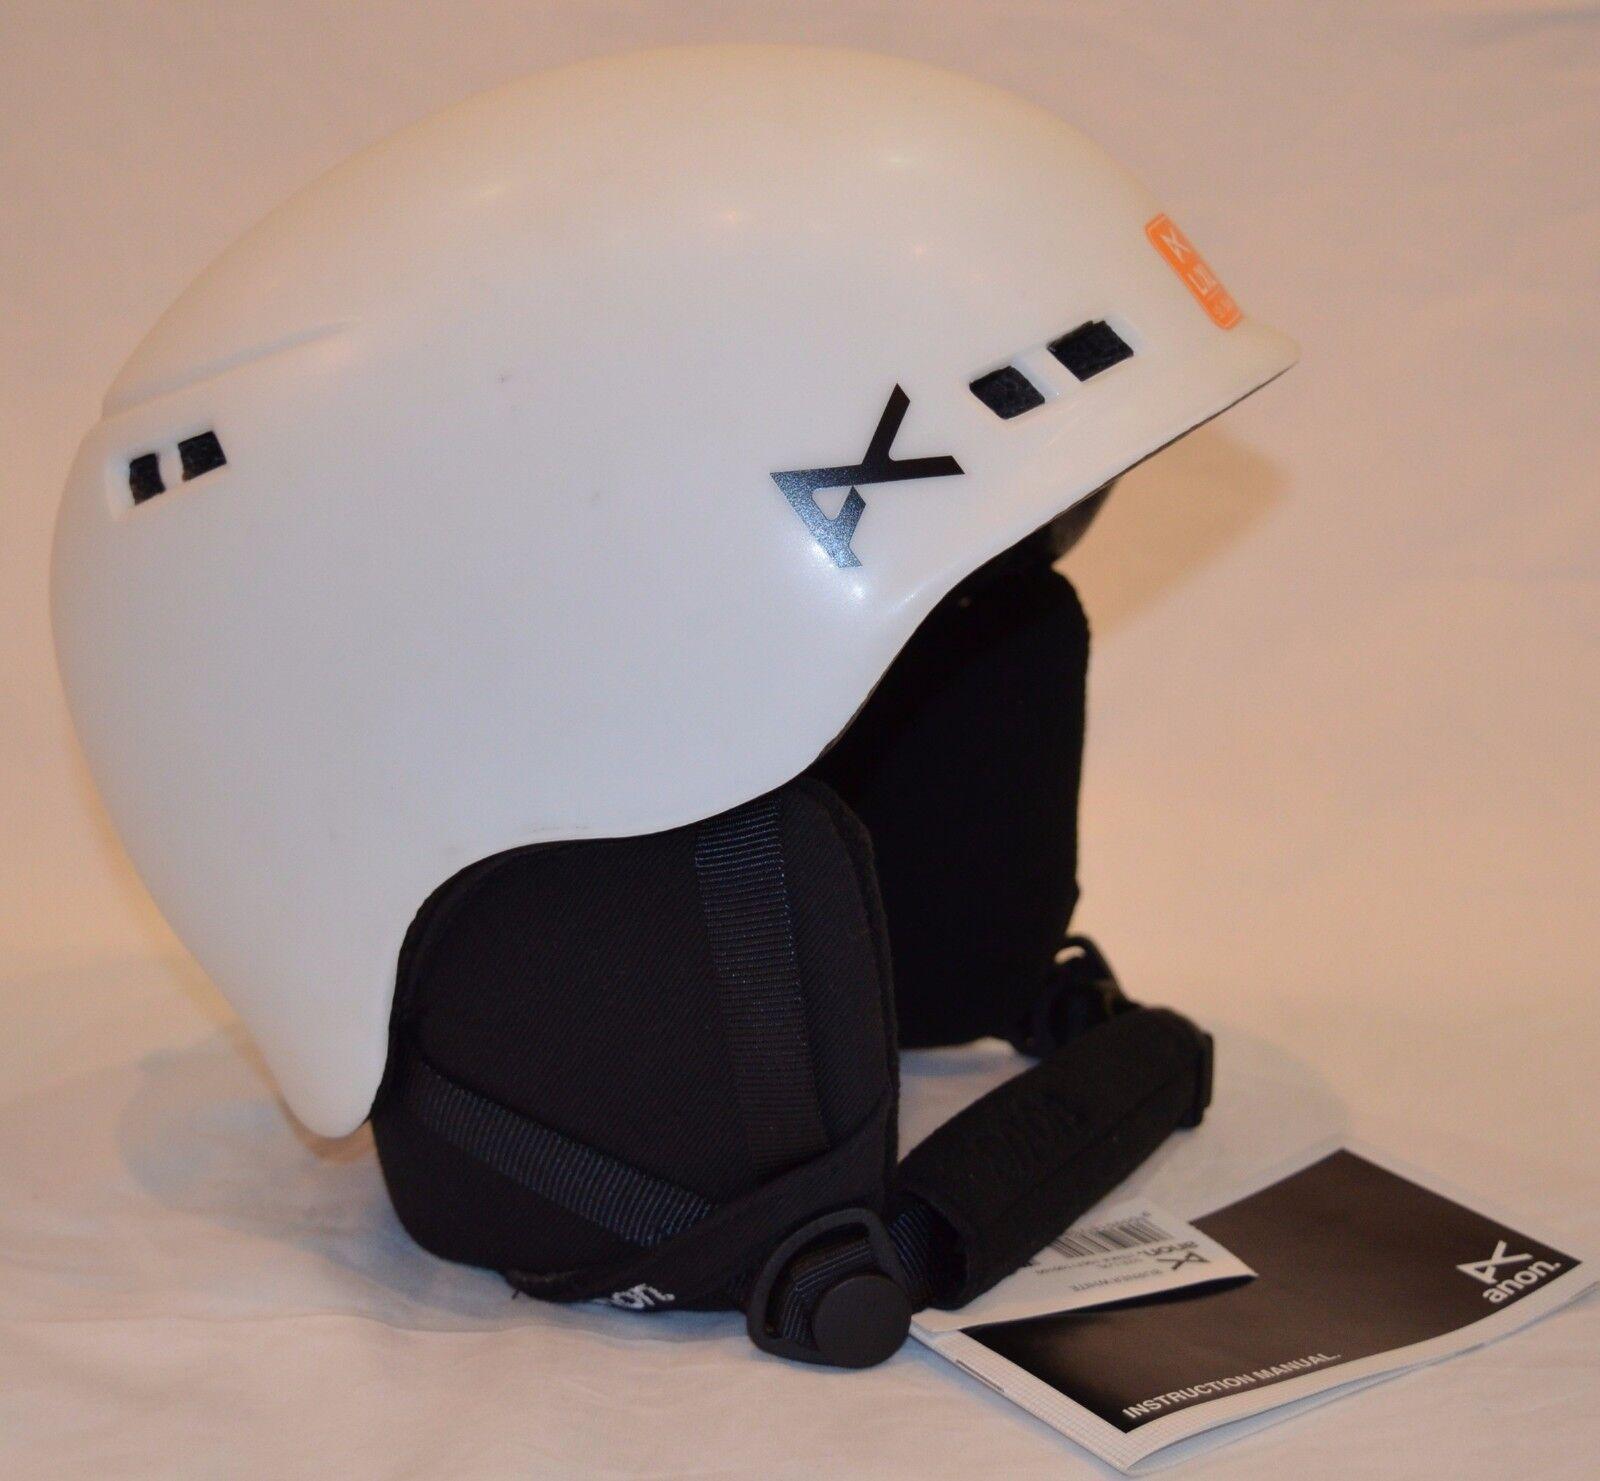 Youth Unisex Burton ANON Burner Helmet Ski Snowboard Helmet - WHITE Size L XL